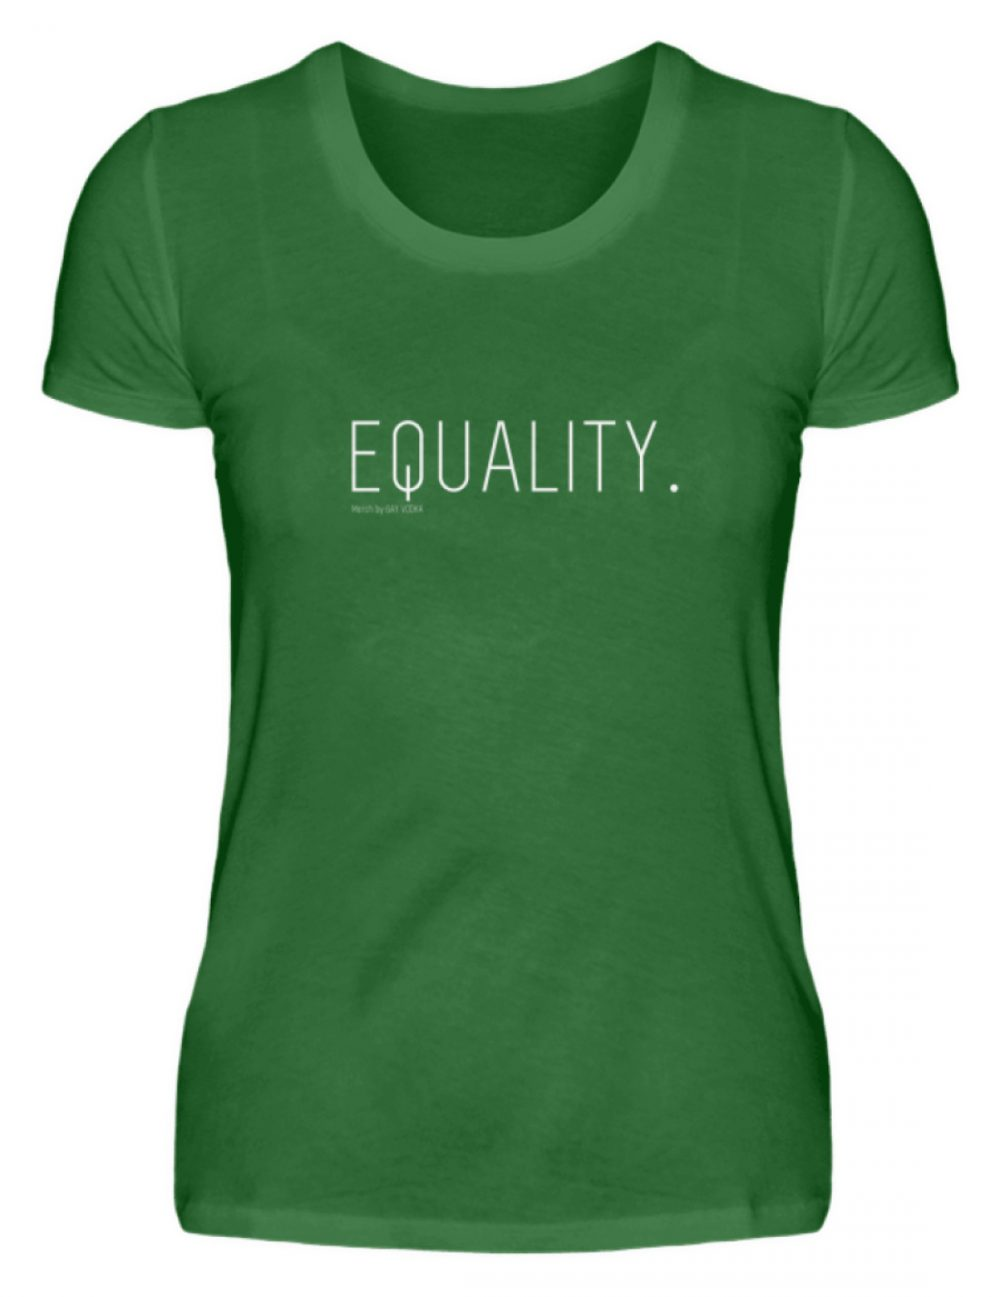 EQUALITY. - Damen Premiumshirt-30